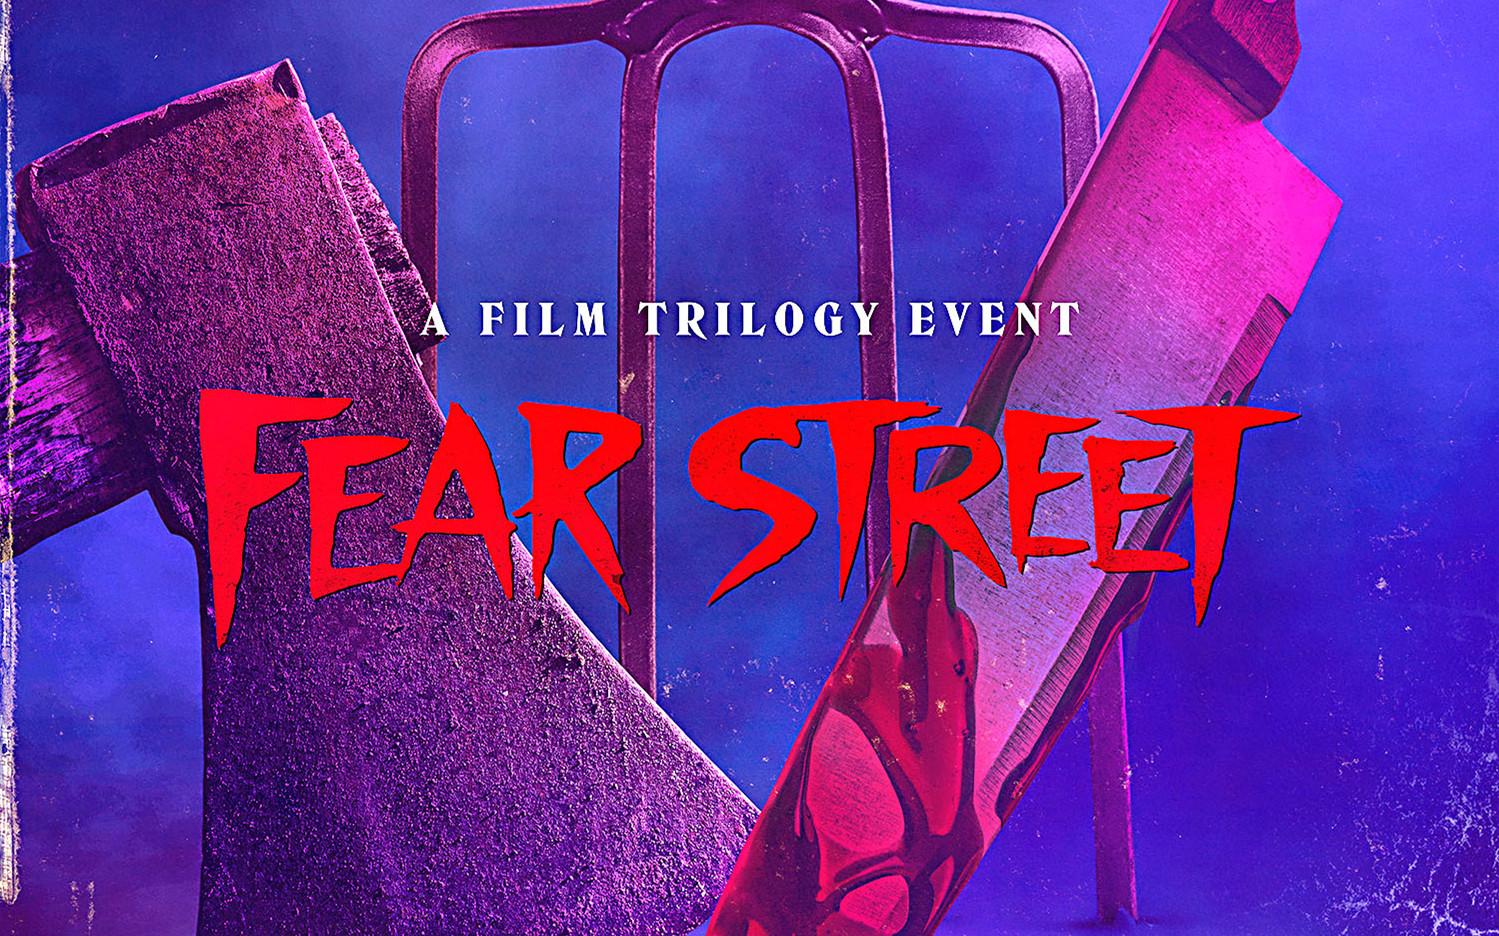 Netflix新片《恐惧街》三部曲发布正式预告